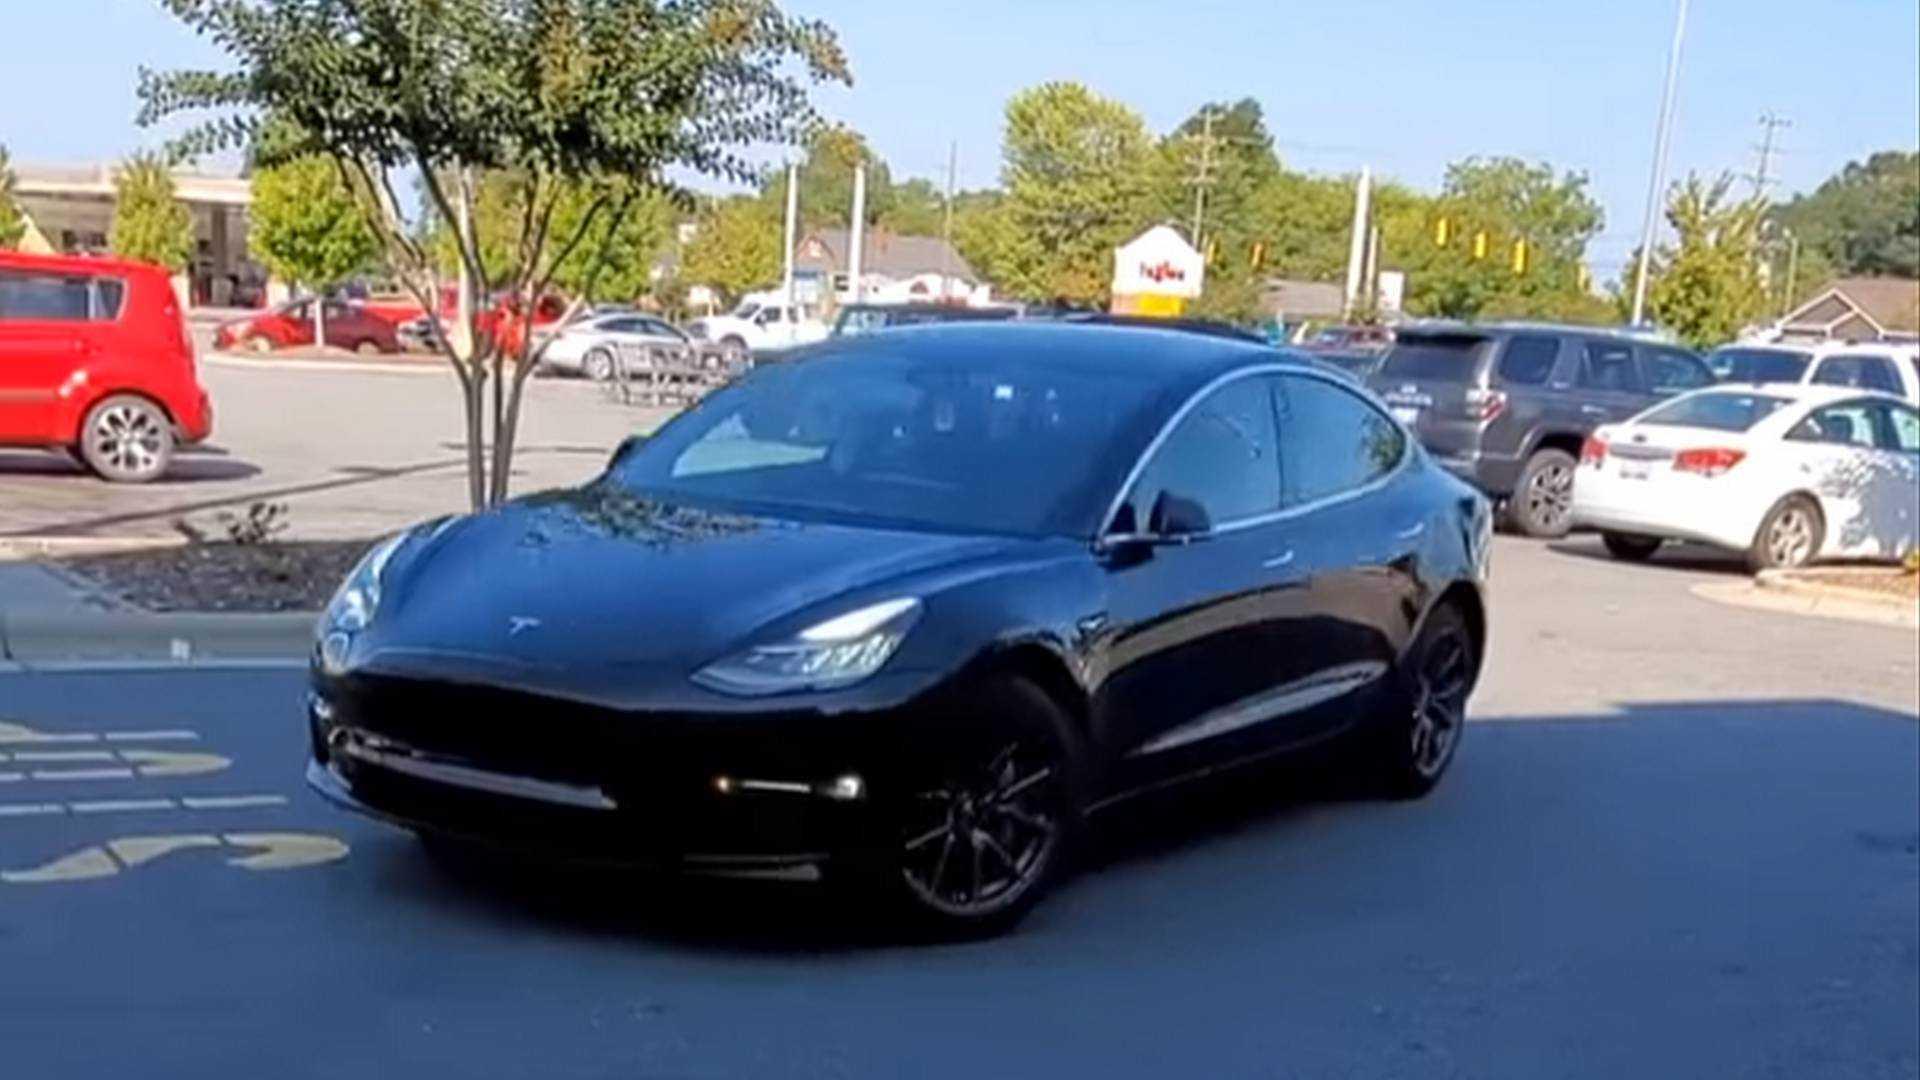 Porsche Engineers Reportedly Impressed By Tesla Autopilot & Summon